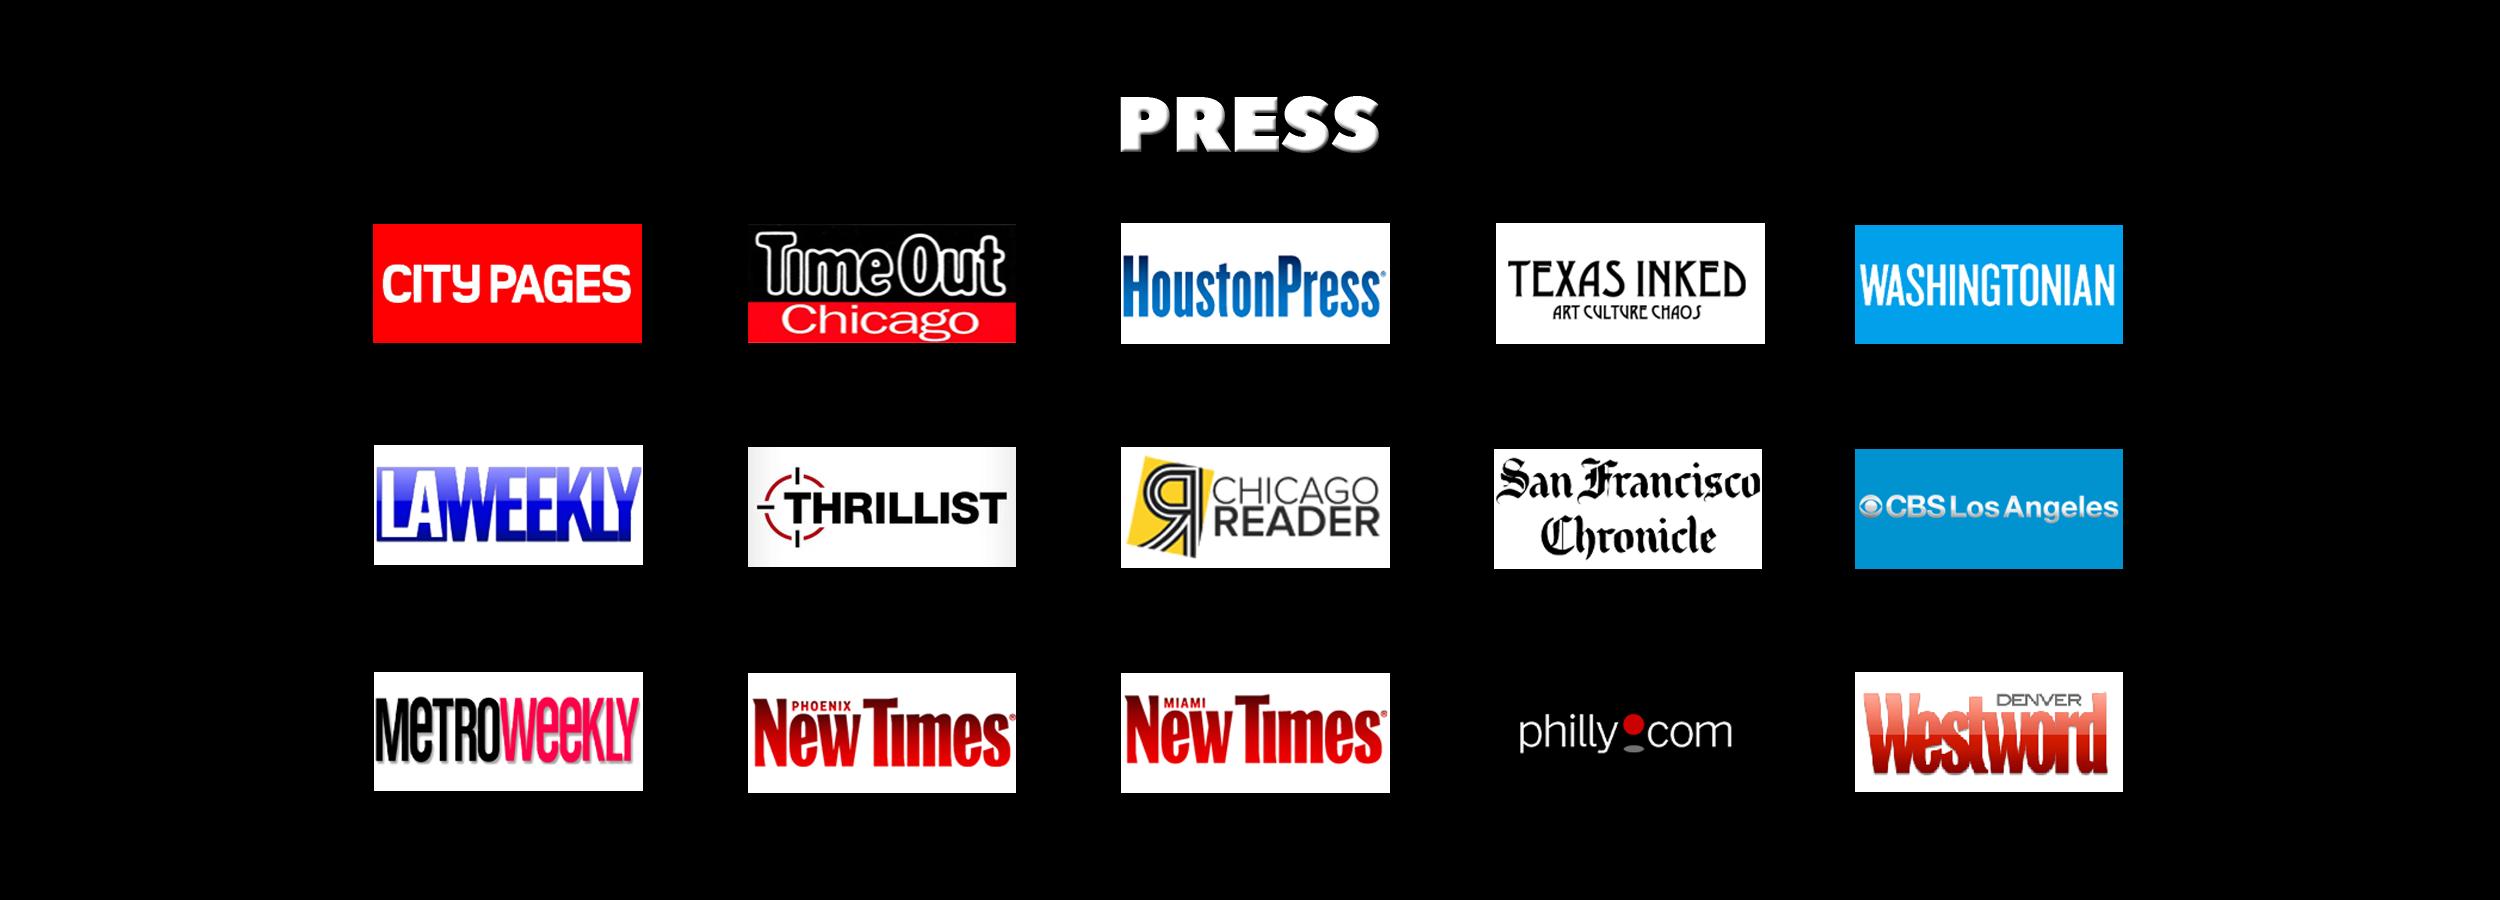 Press.png